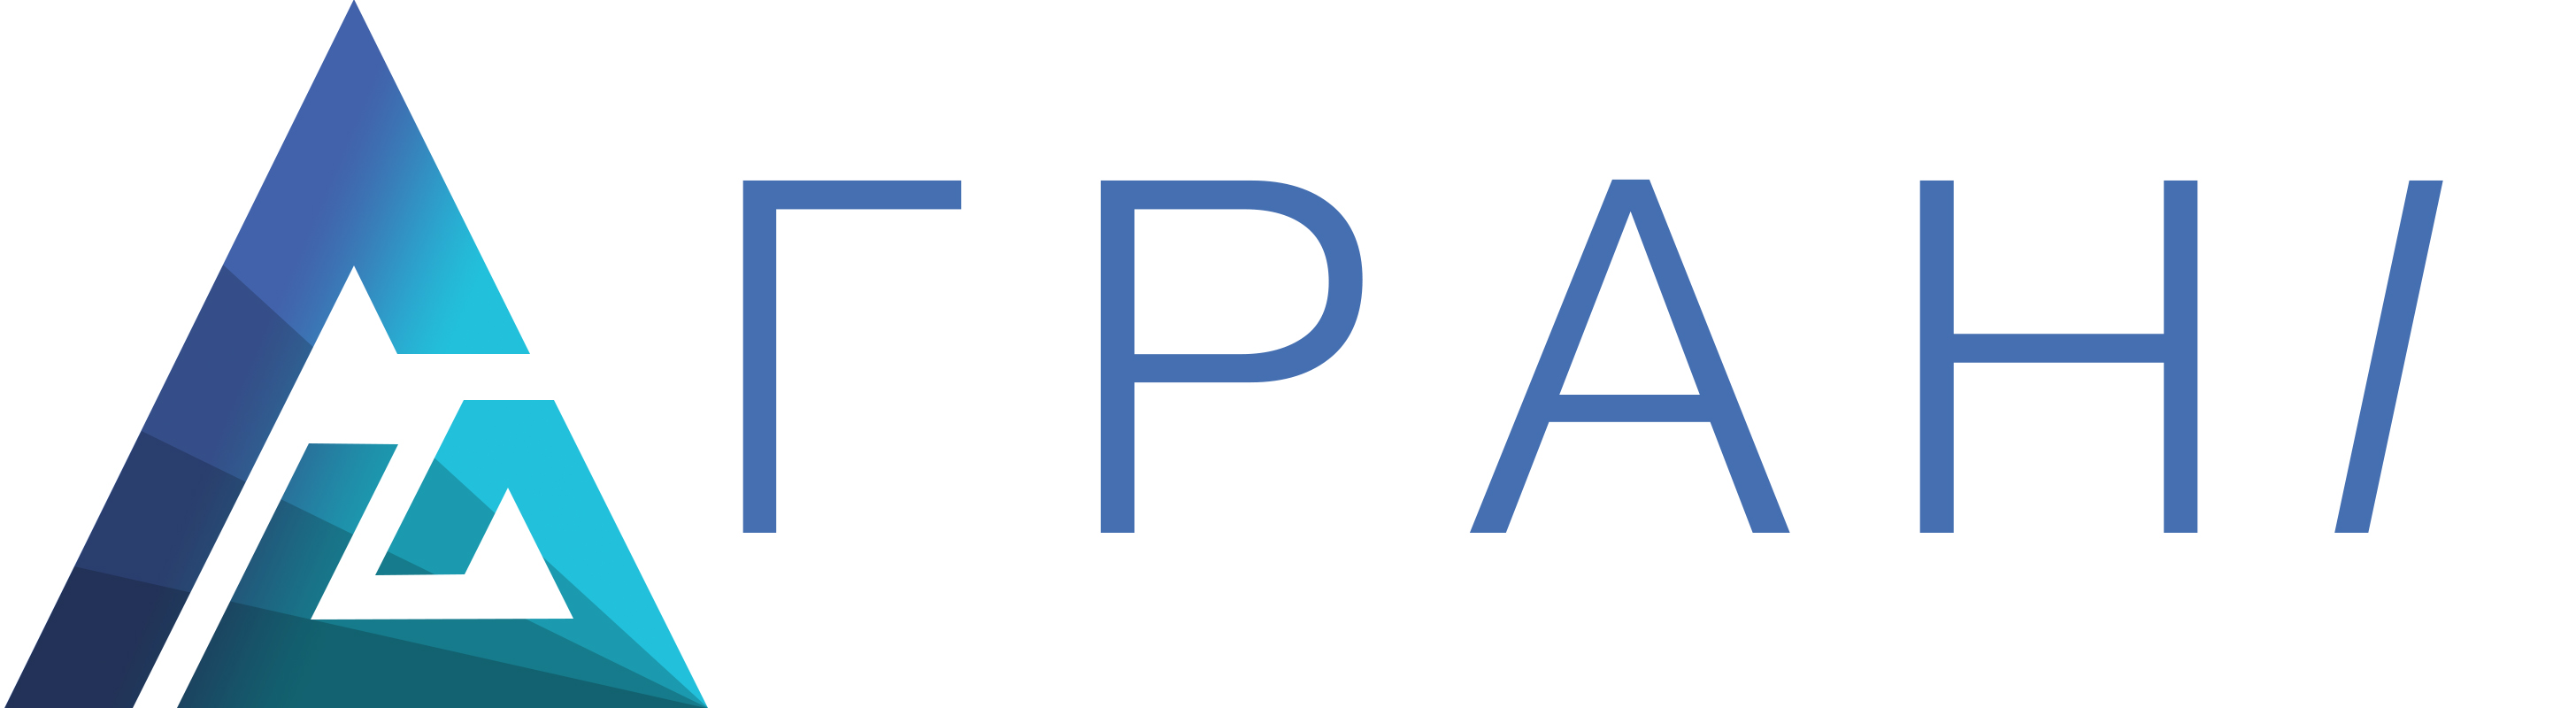 http://dk.dp.ua/wp-content/uploads/2020/01/grani-logo-banner.jpg